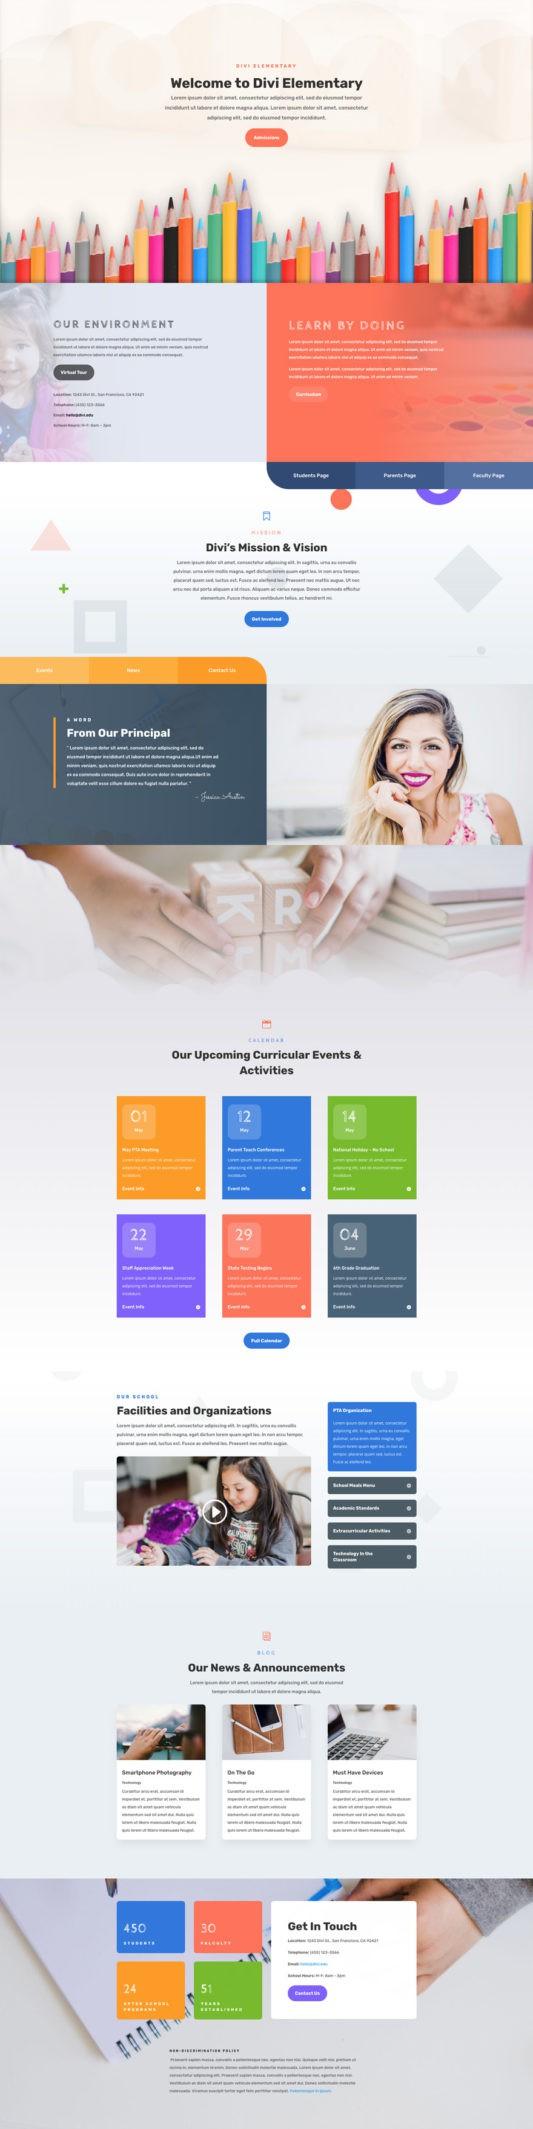 Elementary School Web Design 5